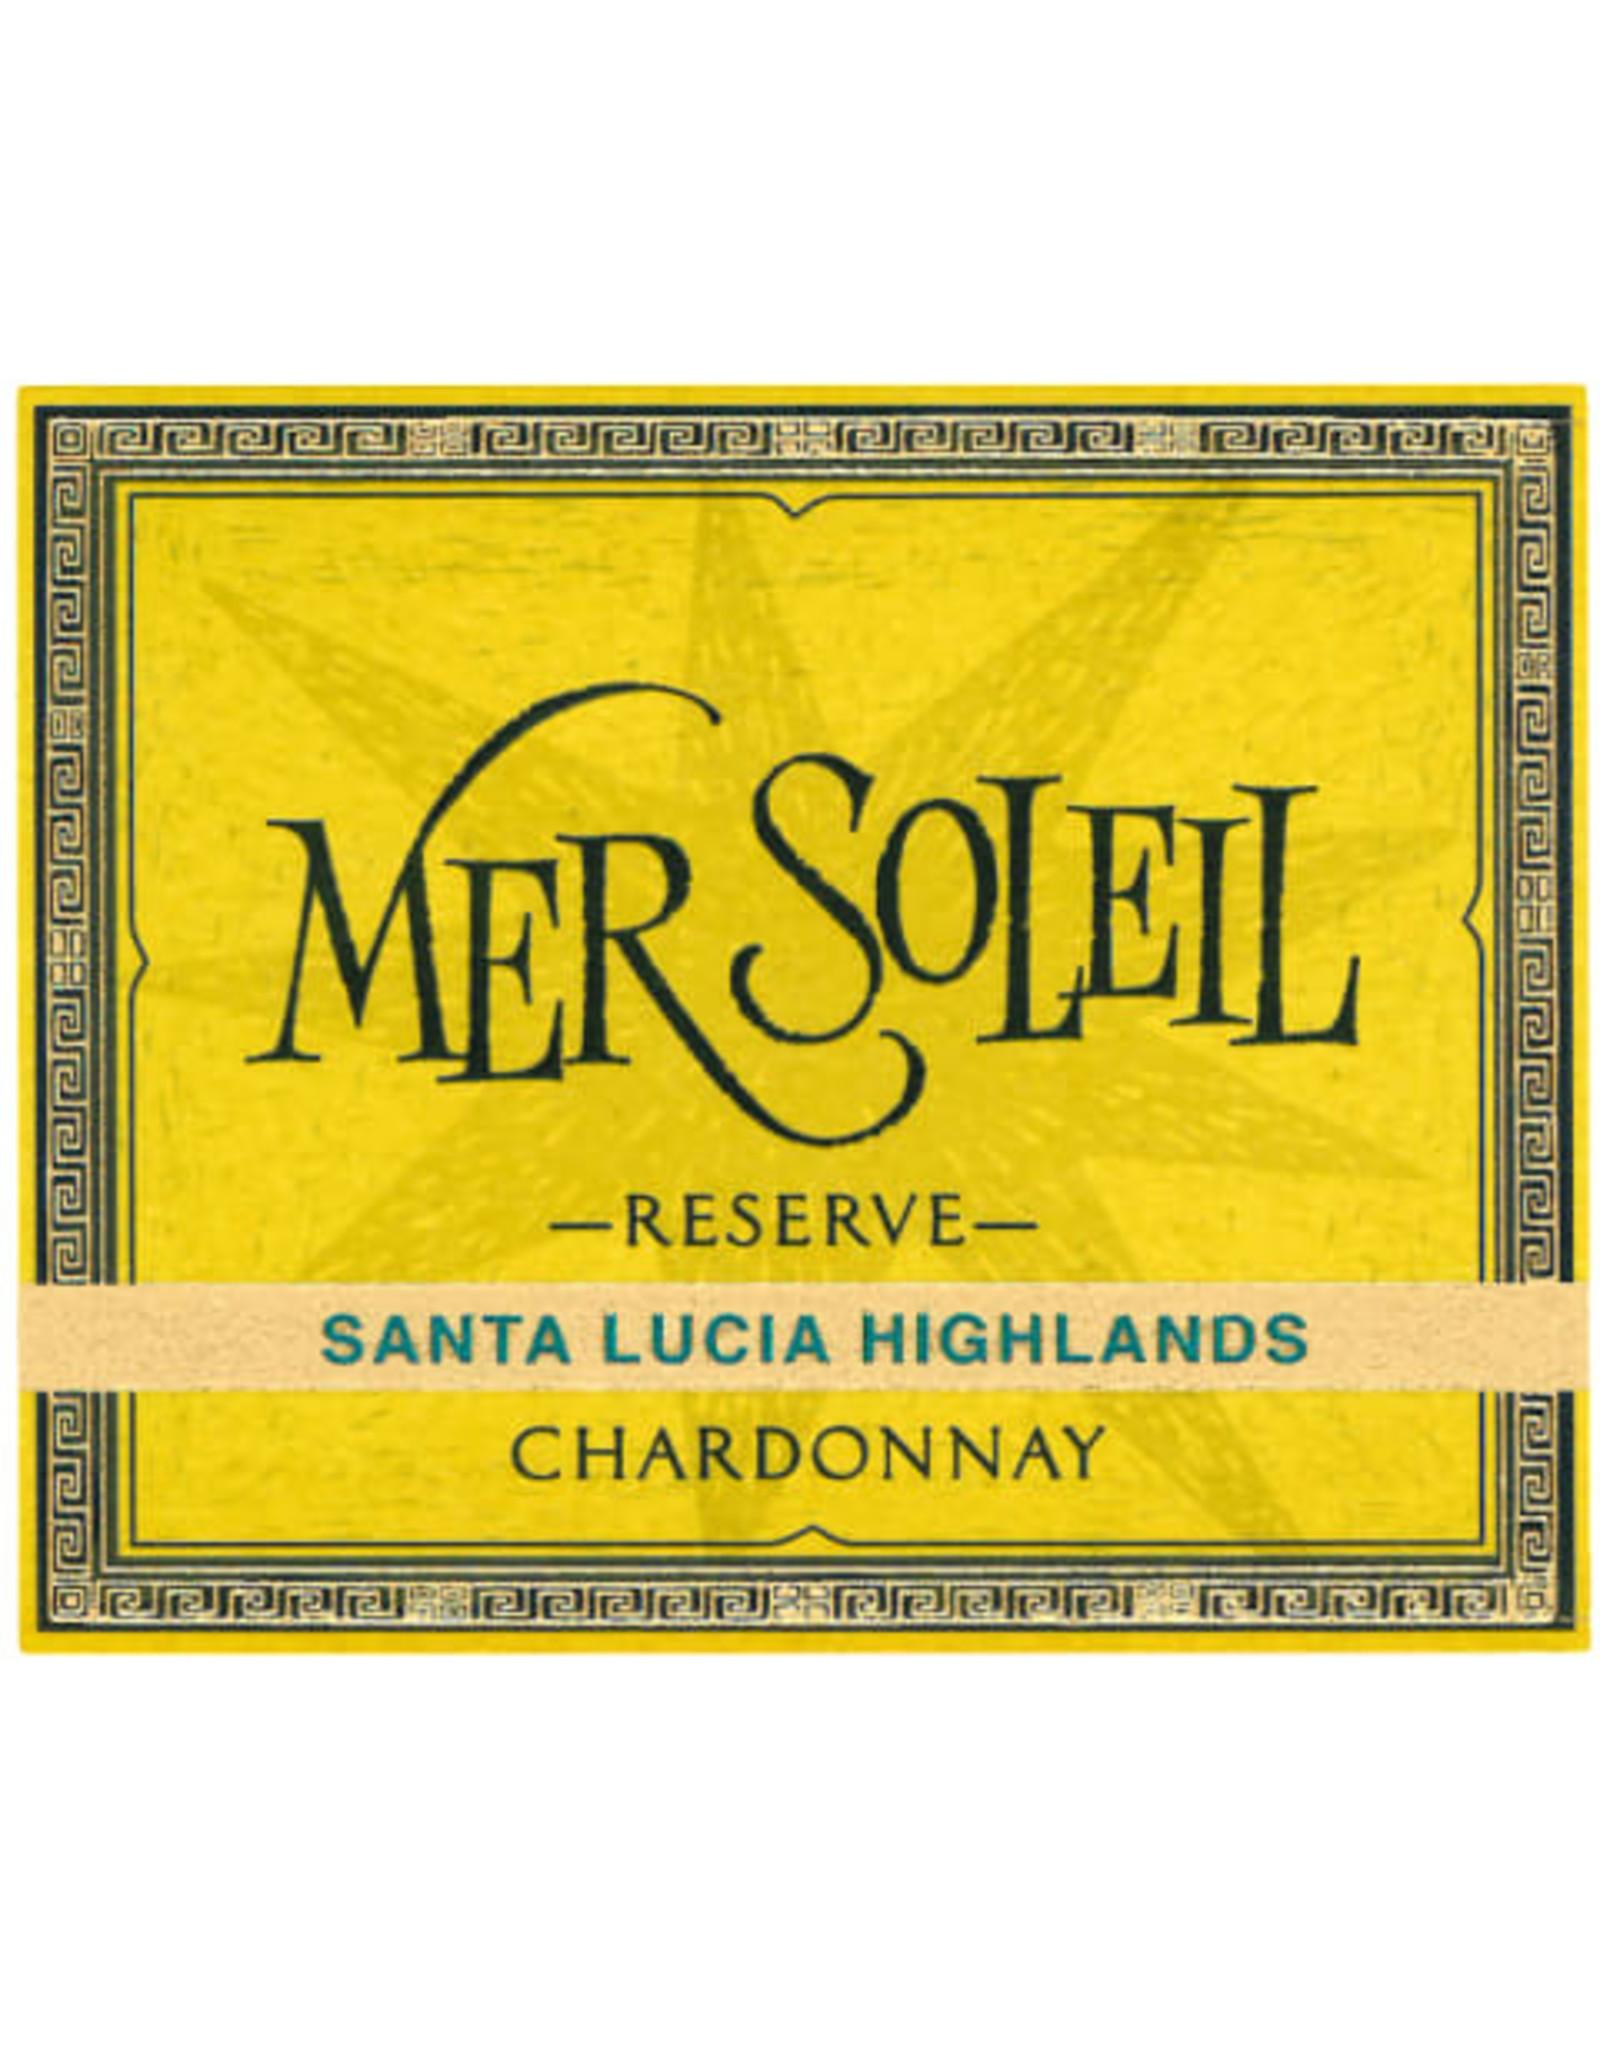 MER SOLEIL RES CHARDONNAY 2017